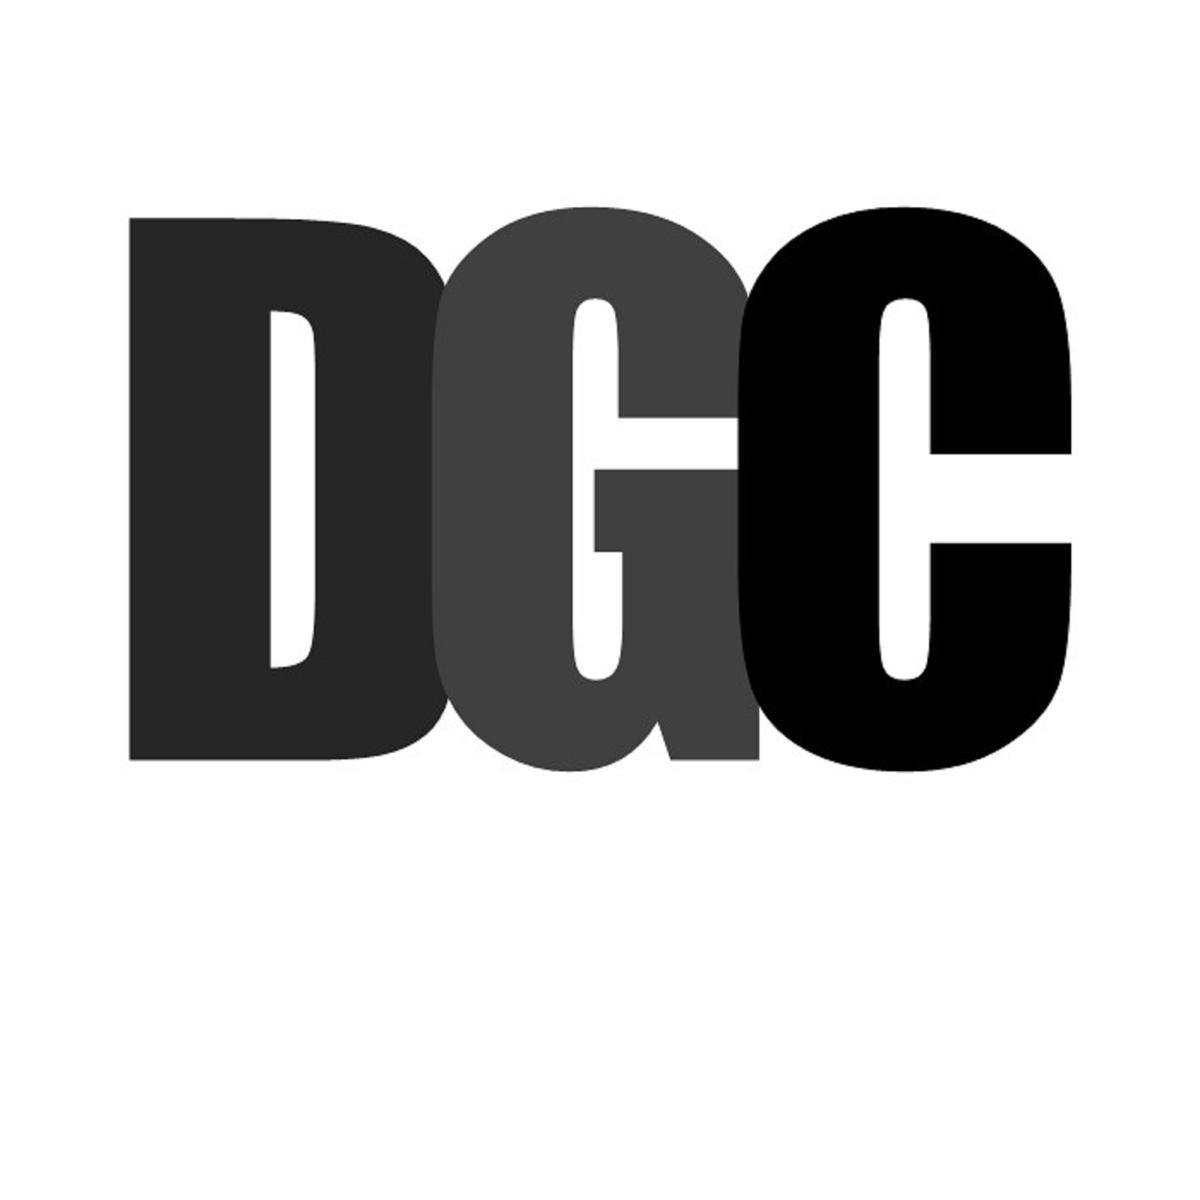 Best Episodes Of Dev Game Club On Podyssey Podcasts Tcash Lebaran April Skin Magic Snow Cushion